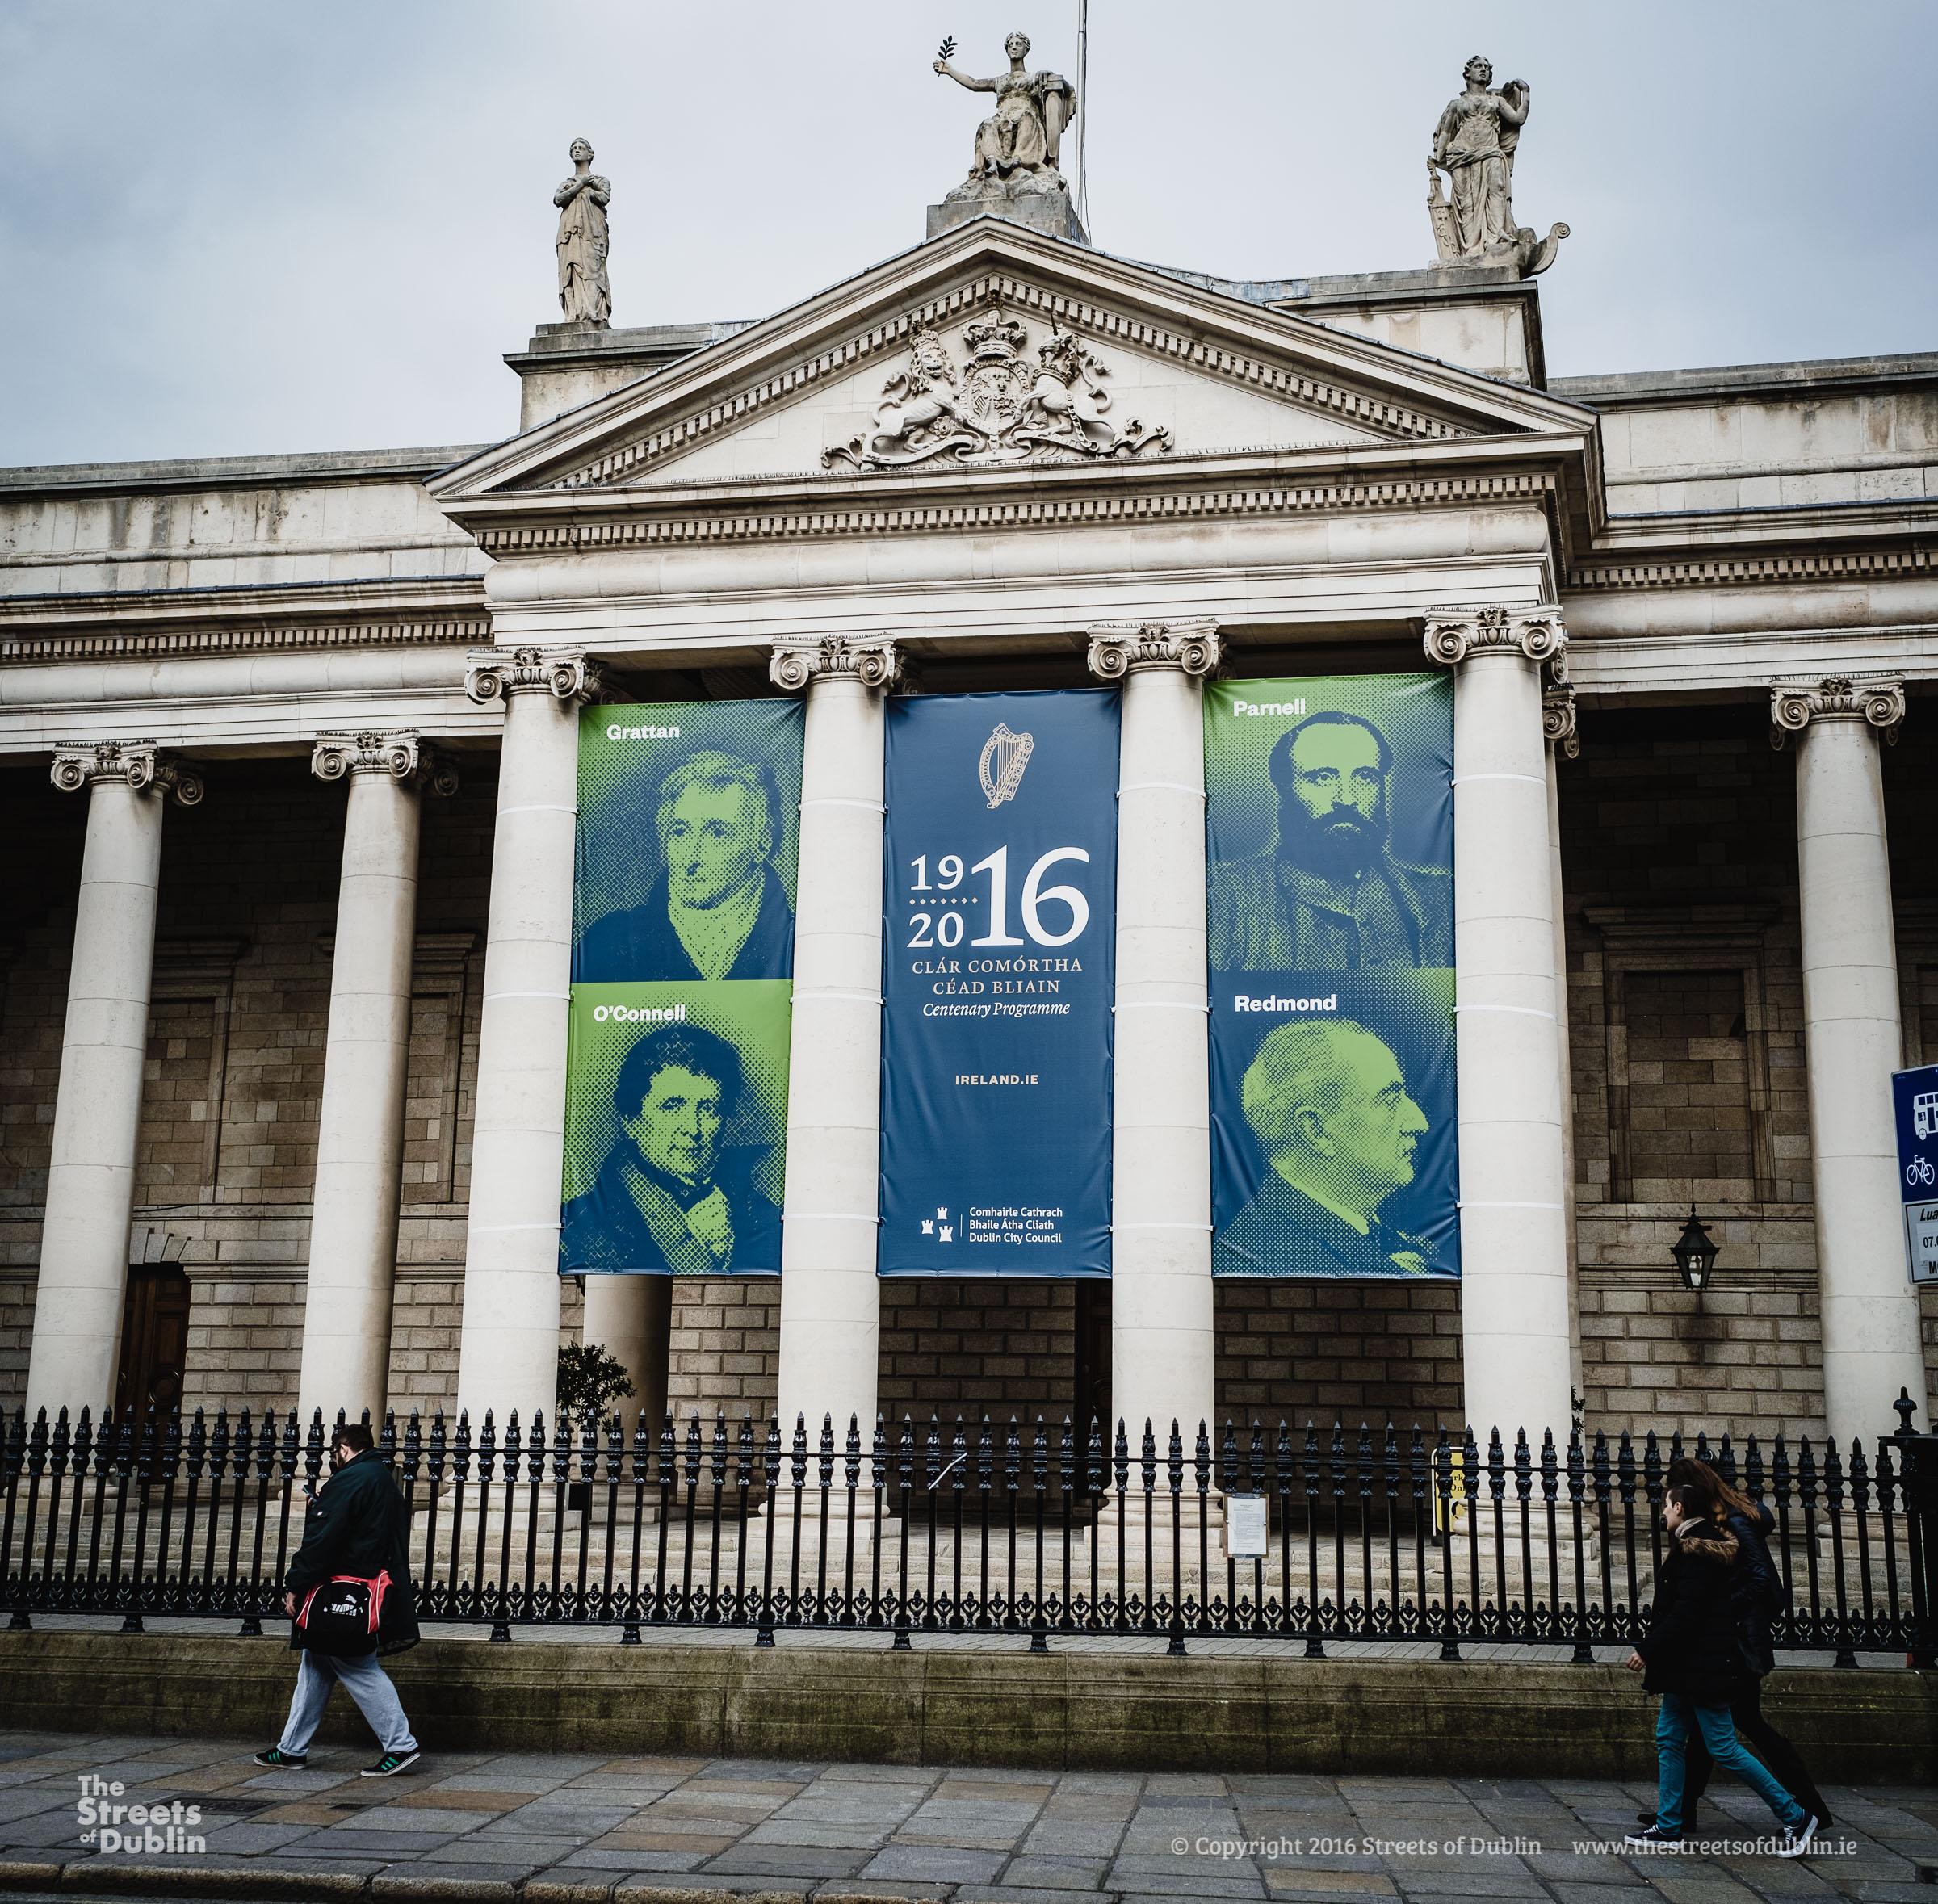 Streets-of-Dublin-Photo-.jpg